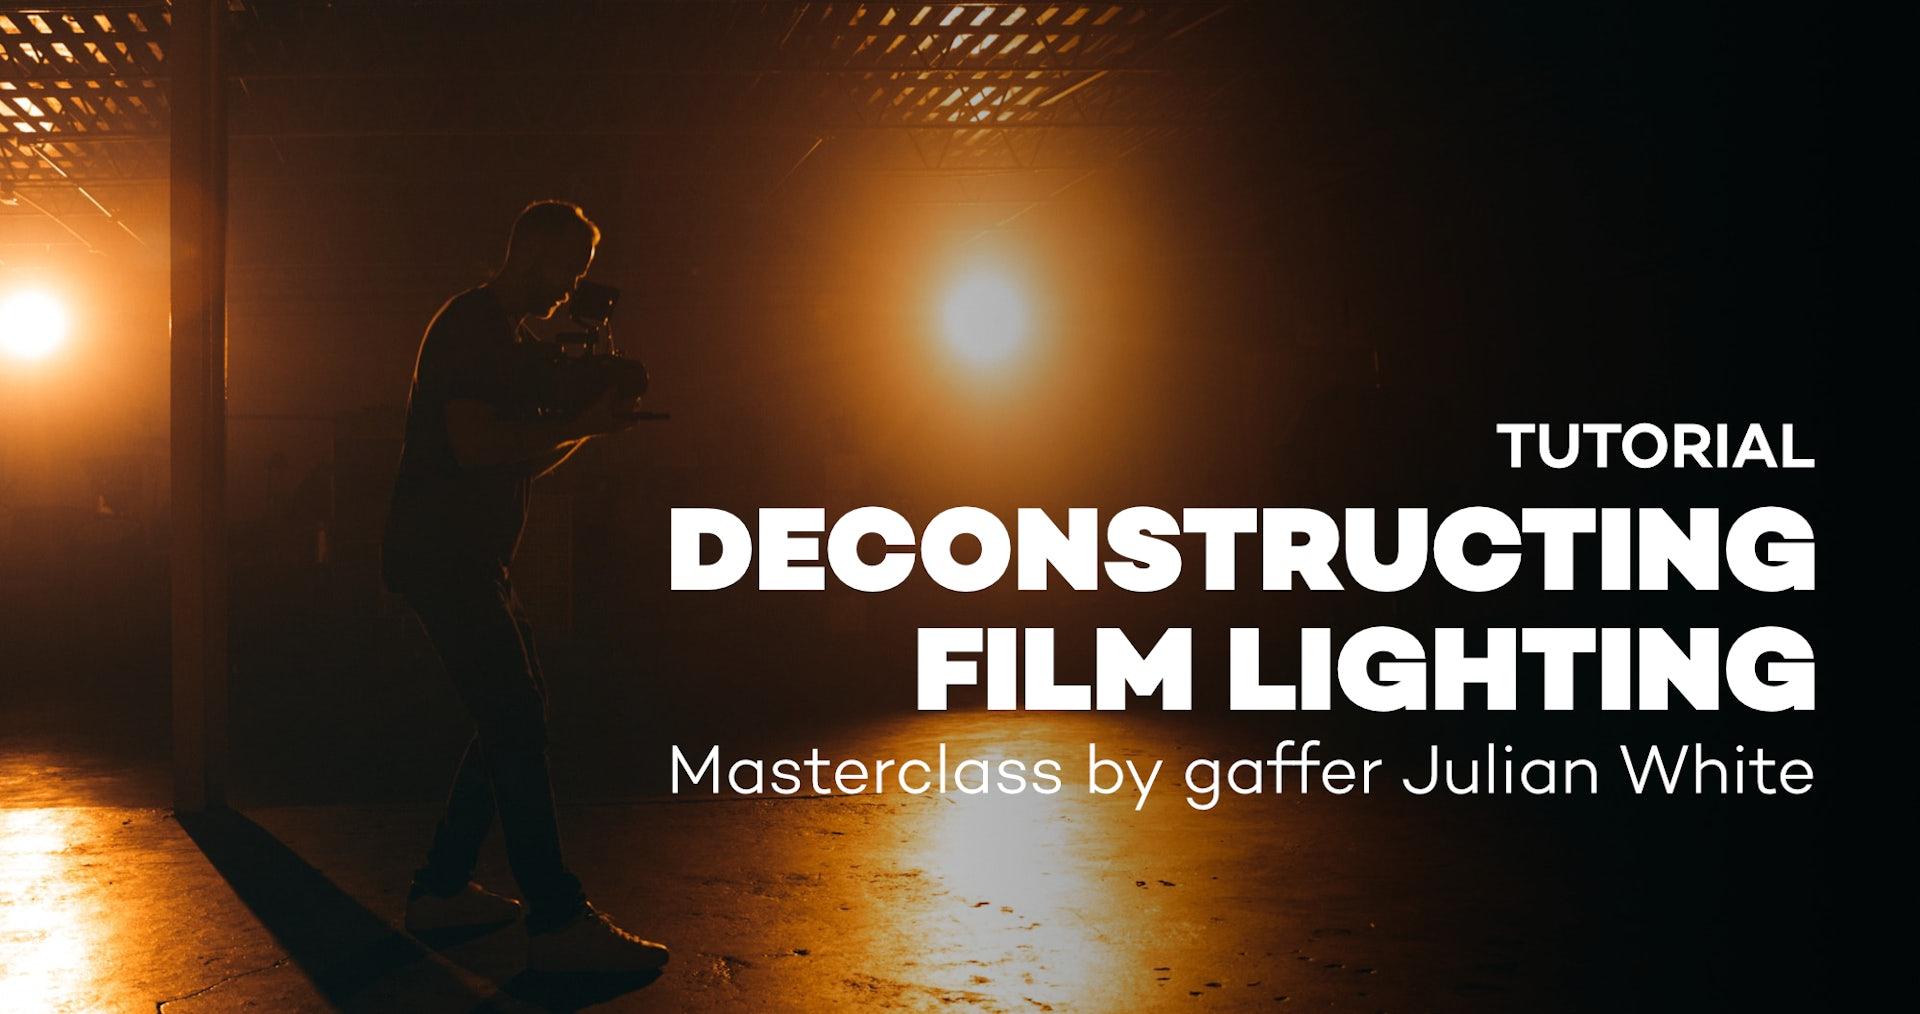 Tutorial Deconstructing Film Lighting